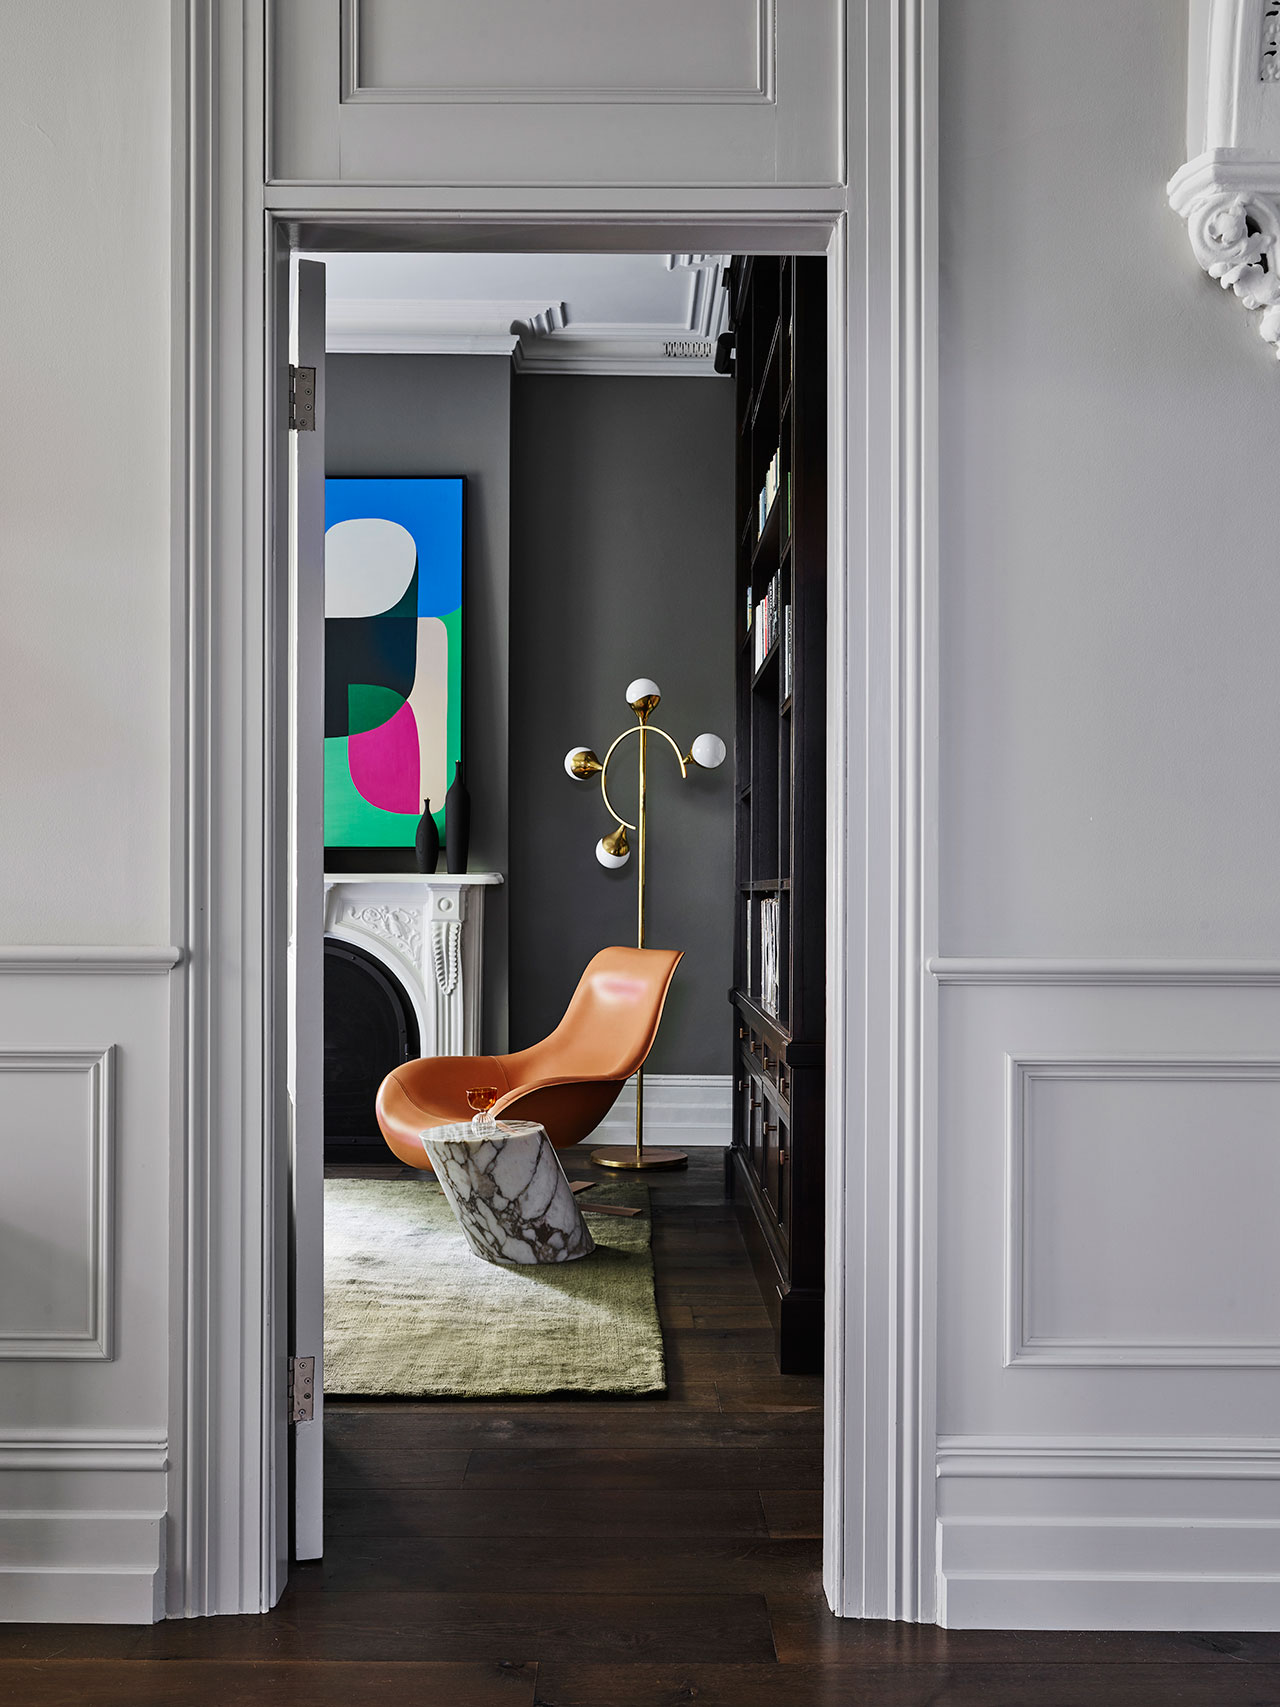 Art House by Studio CD - Claire Driscoll Delmar. Study. Photo by Anson Smart.